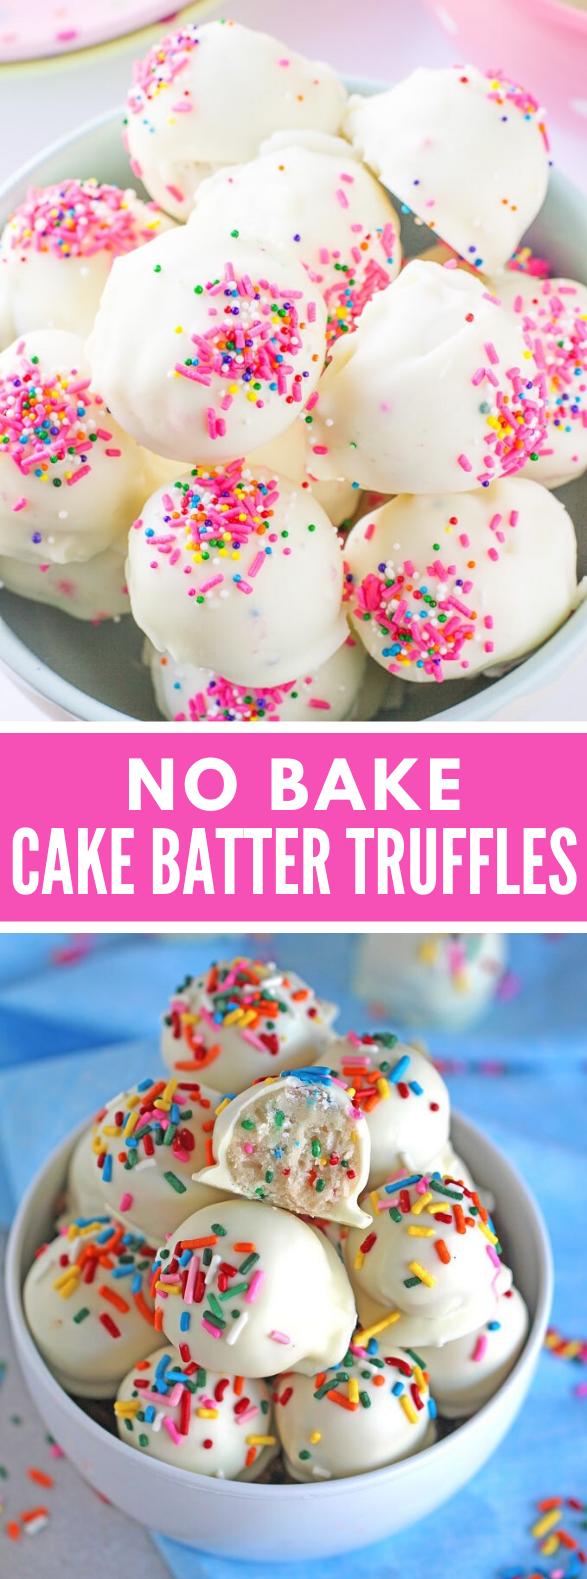 No Bake Cake Batter Truffles #desserts #cookies